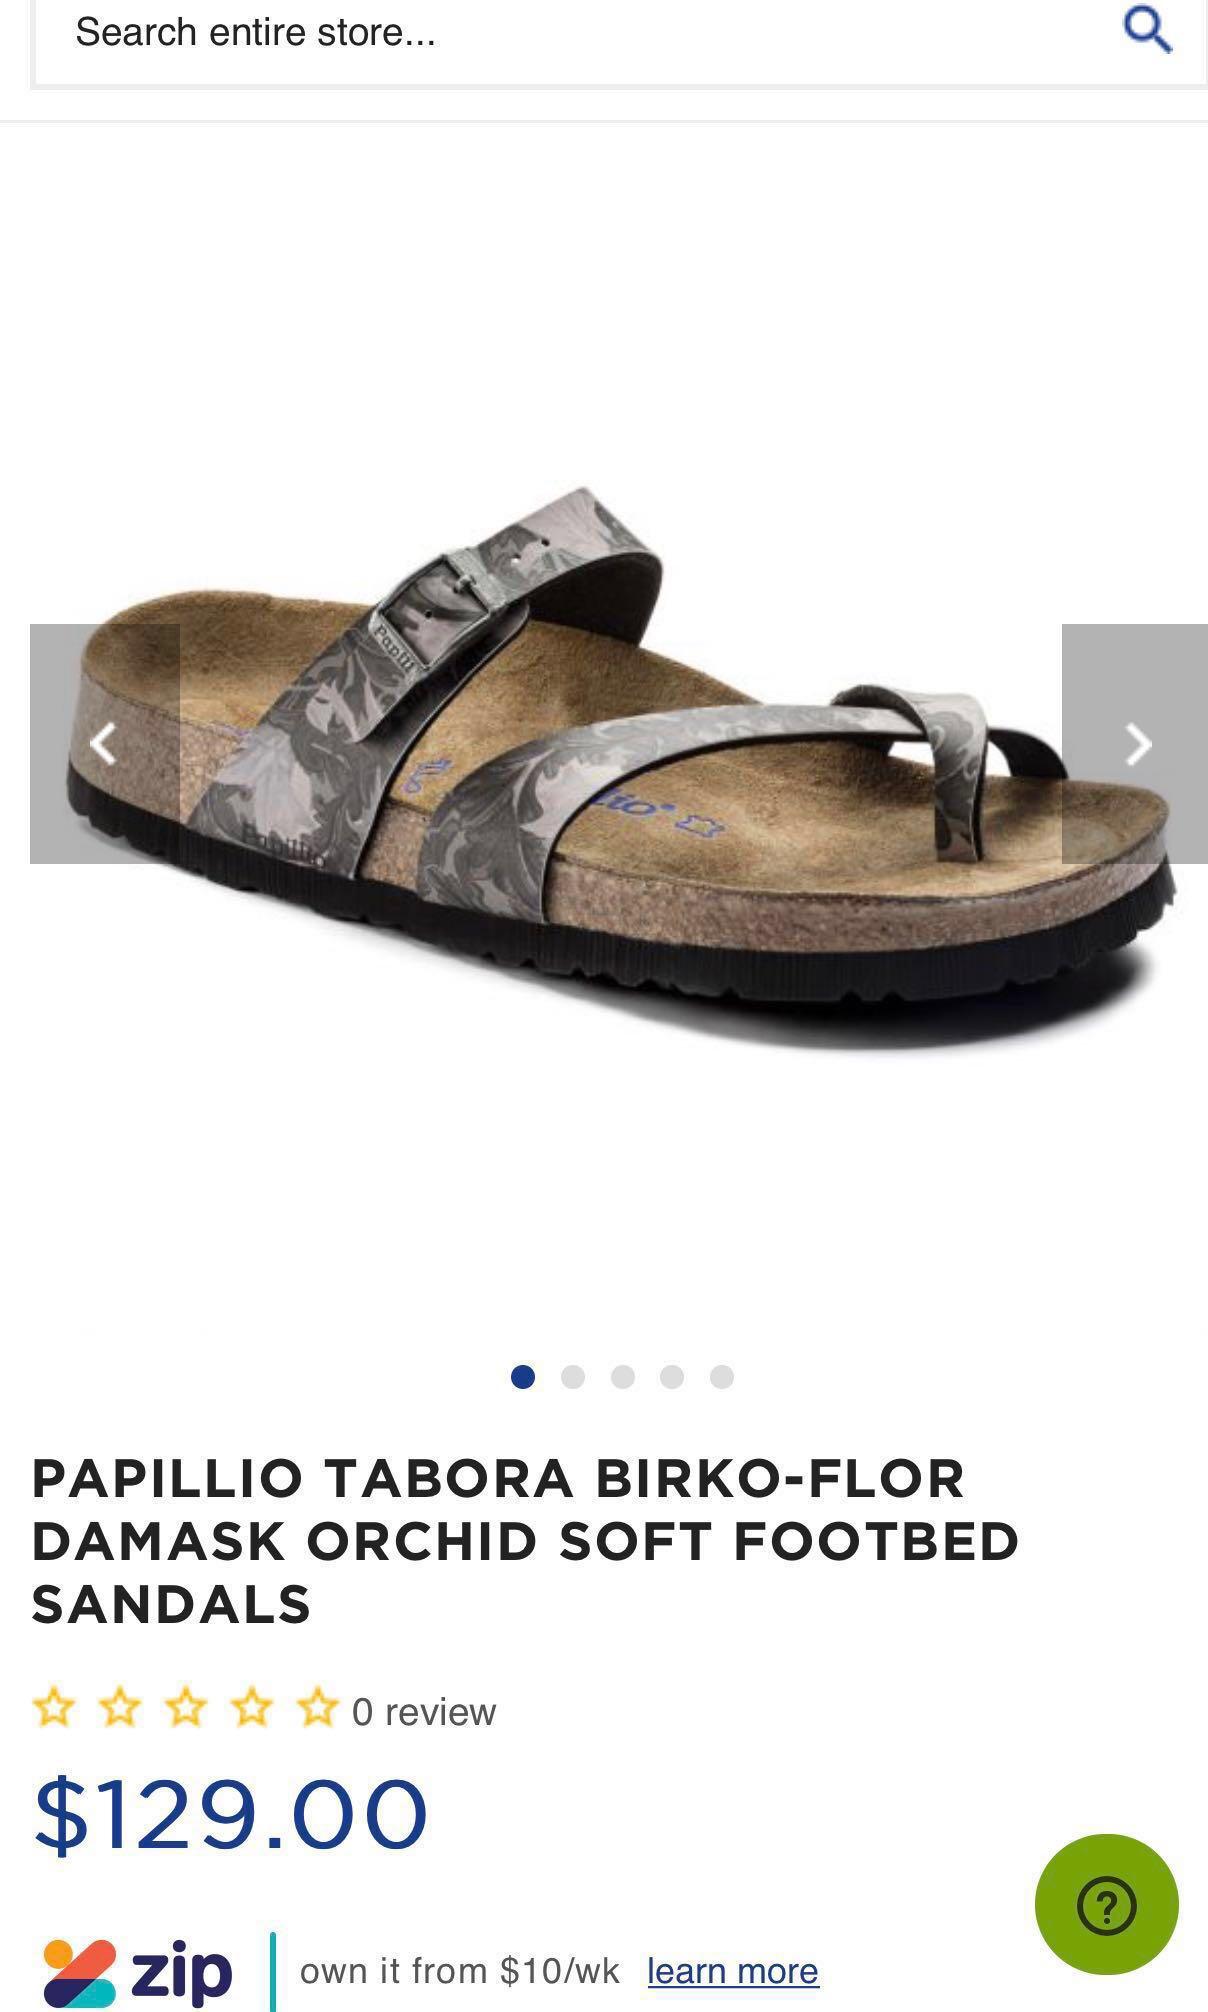 06e266cd69c0 BNIB Size 38 Papillio (by Birkenstock) Tabora Orchid Birkoflor ...